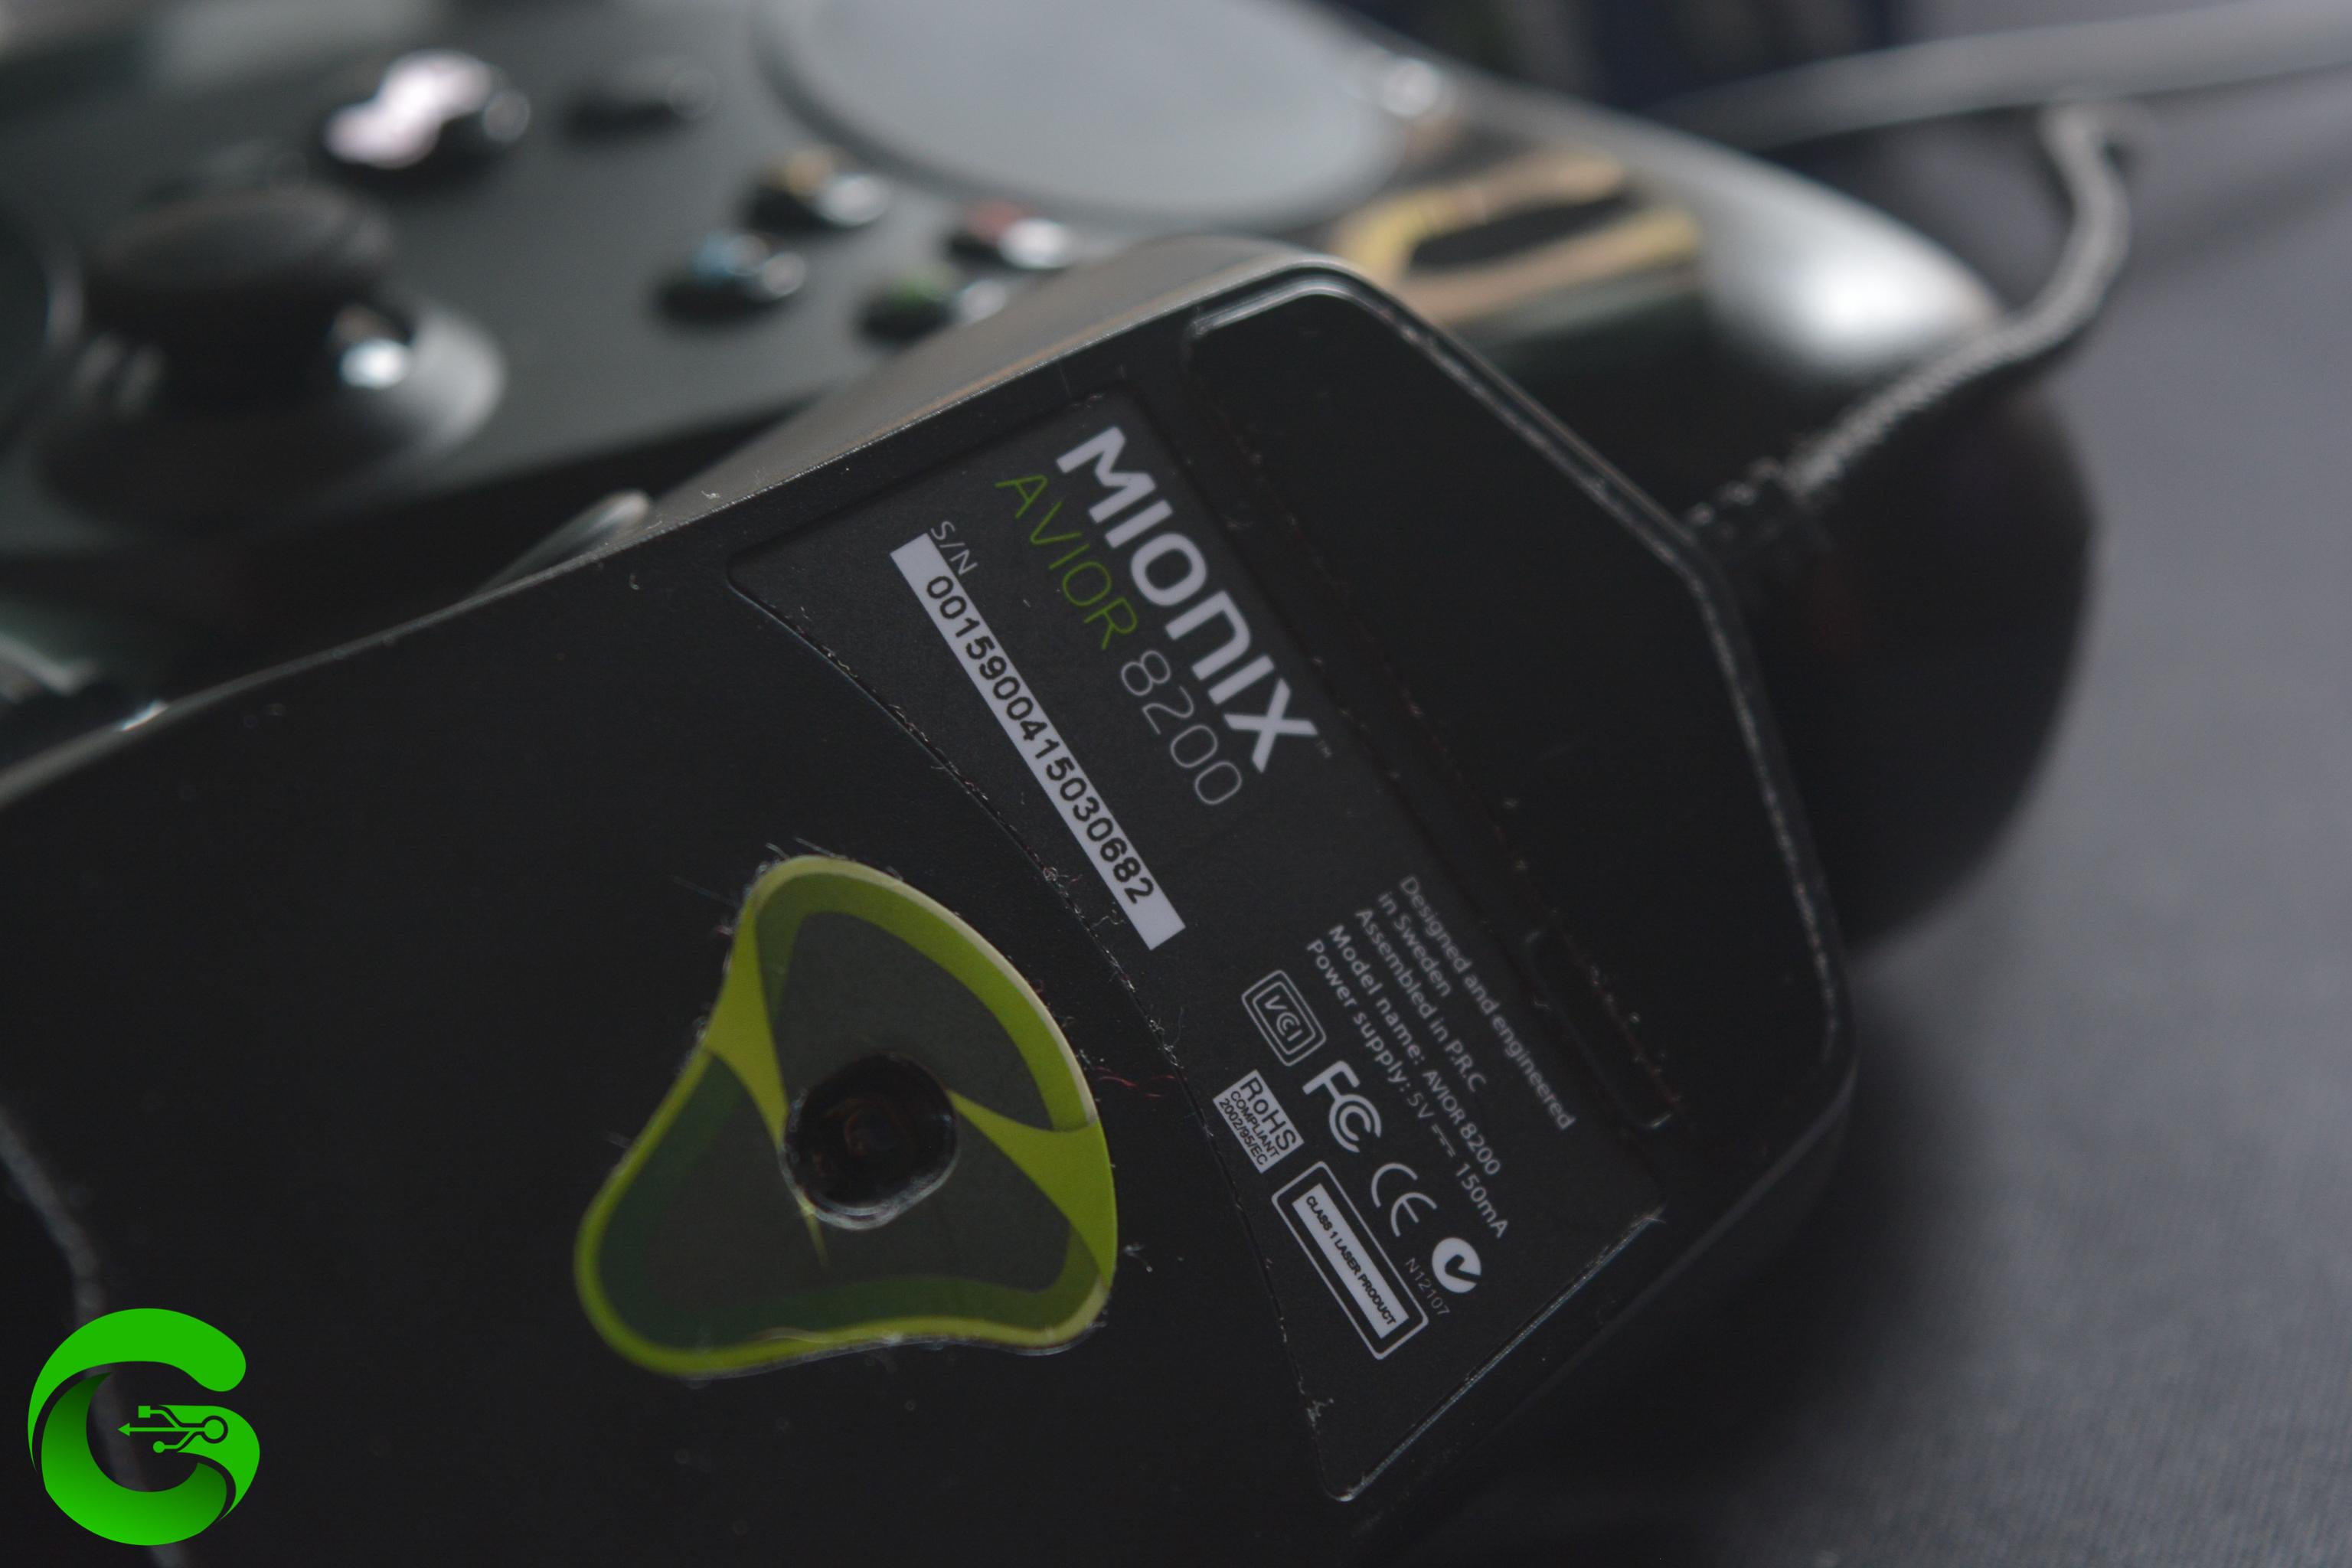 gizcomputer-mionix-avior-8200-review-2